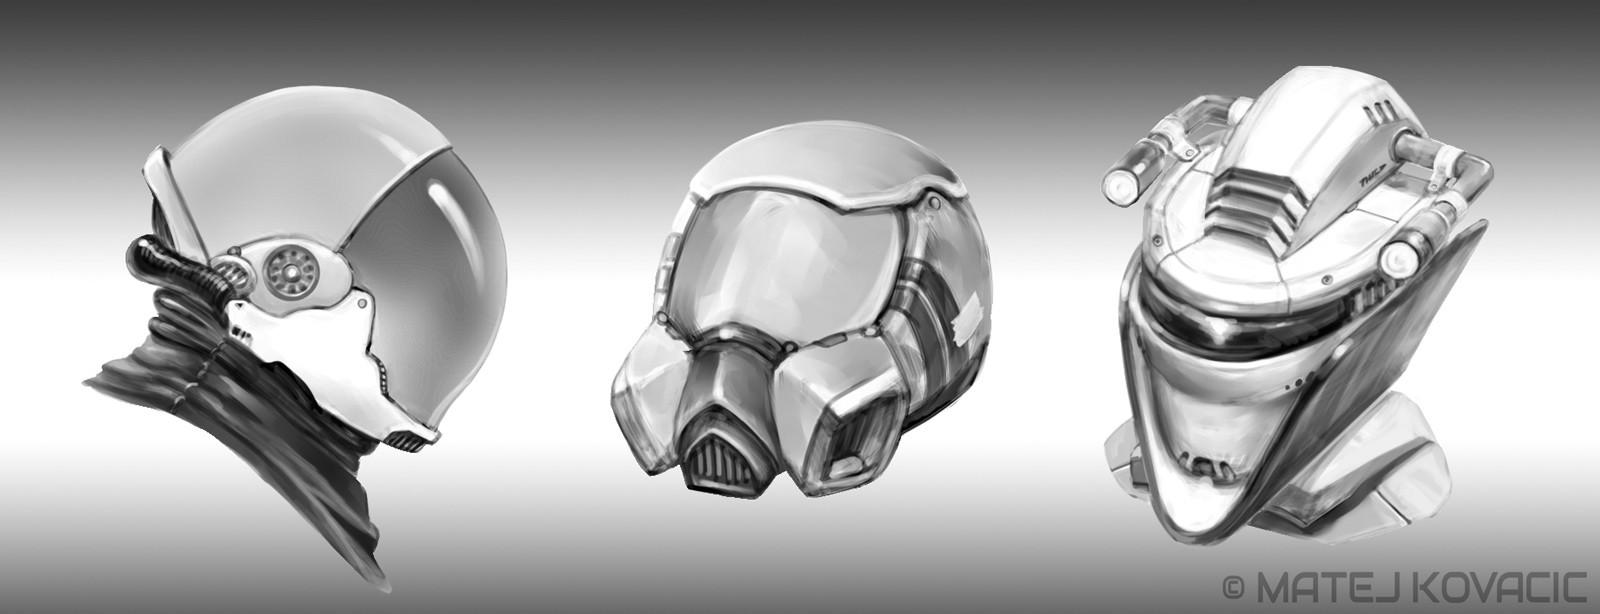 Matej kovacic robot helmet design 002 by matej kovacic